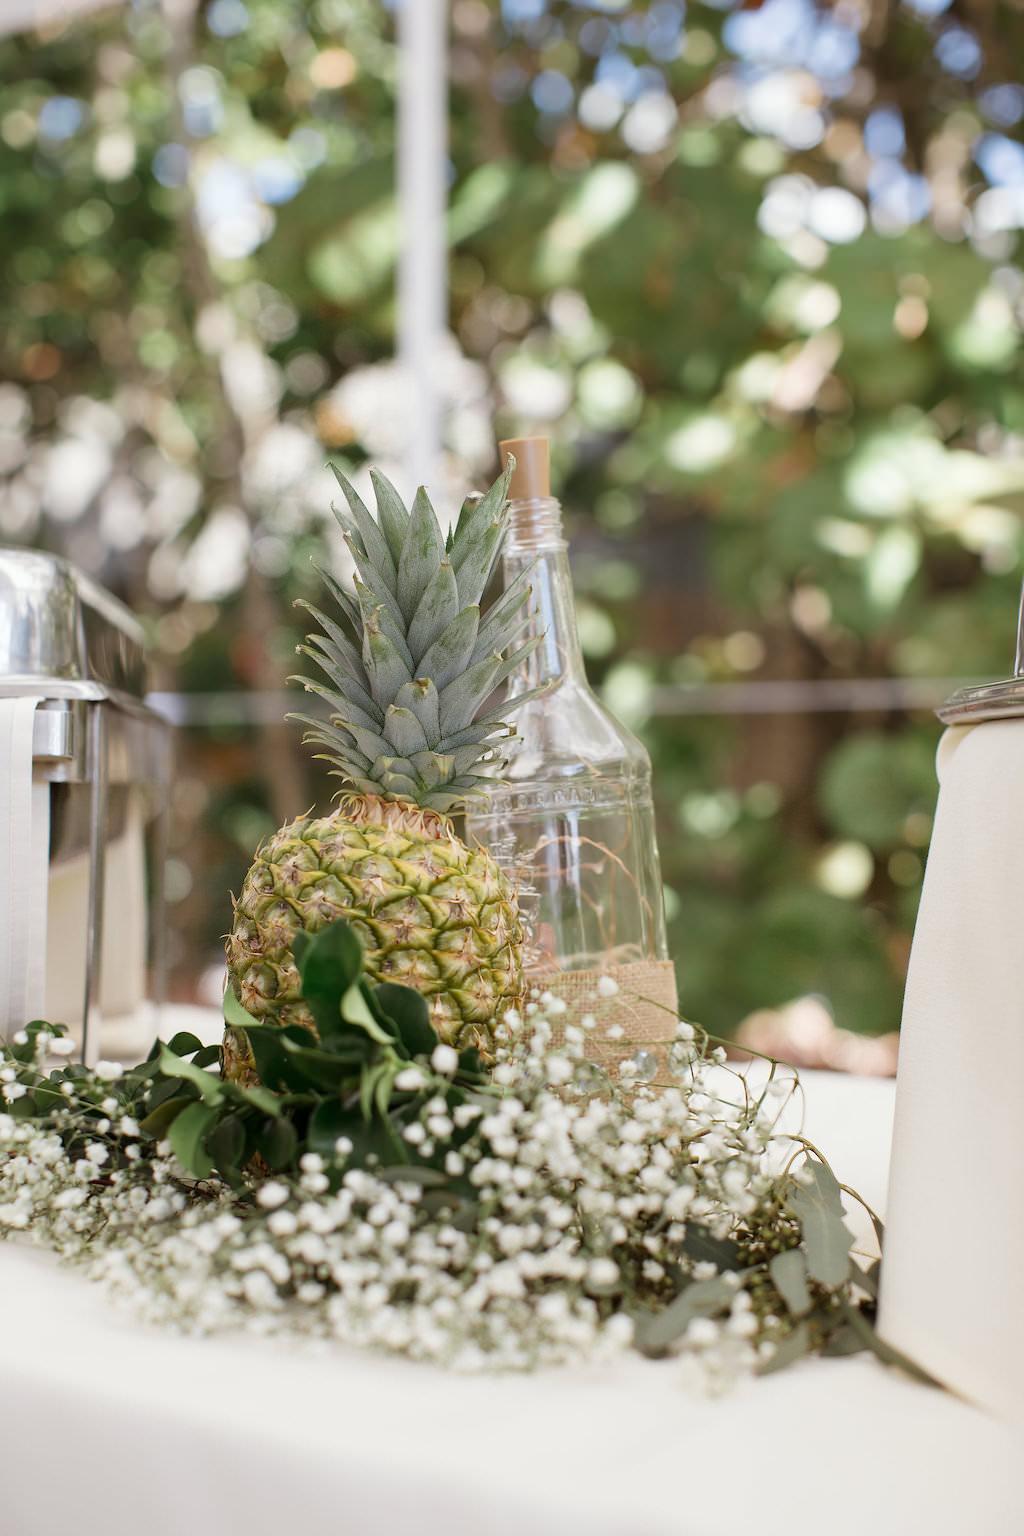 Tropical Inspired Wedding Reception Decor, Pineapple, White Baby's Breathe, Empty Wine Bottle Centerpiece